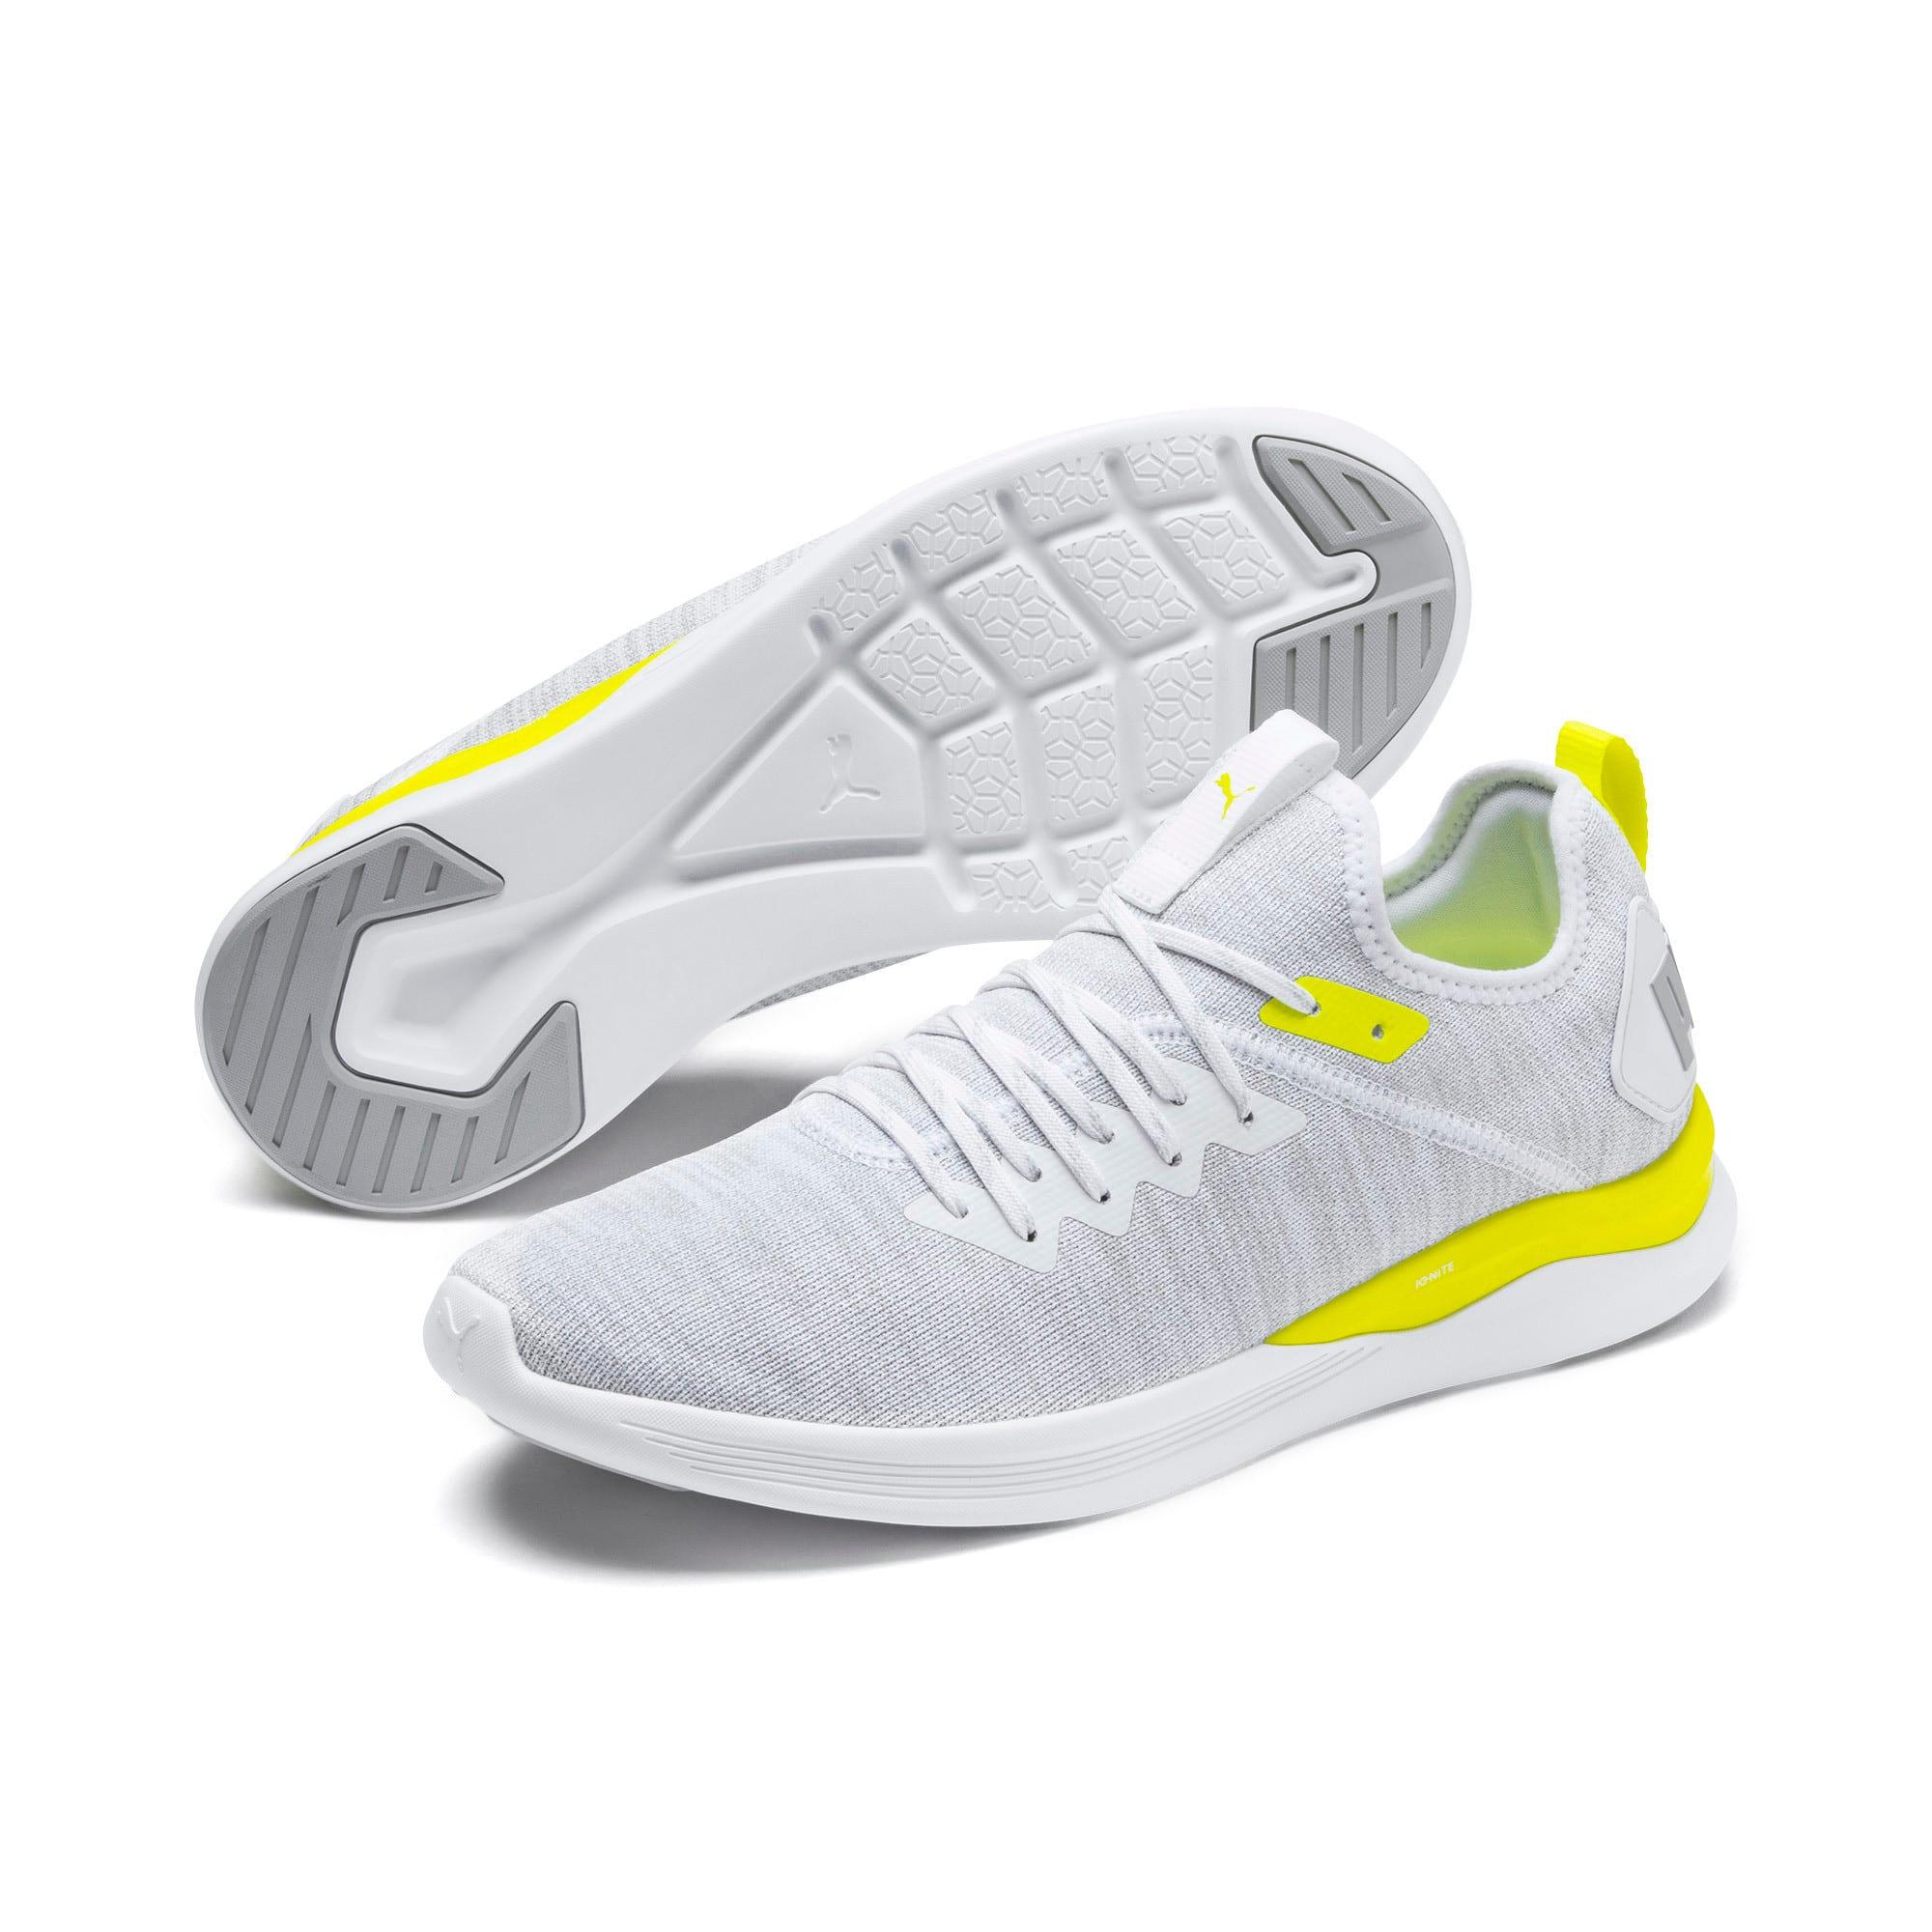 Thumbnail 4 of IGNITE Flash evoKNIT Men's Training Shoes, White-High Rise-Yellow Alert, medium-IND